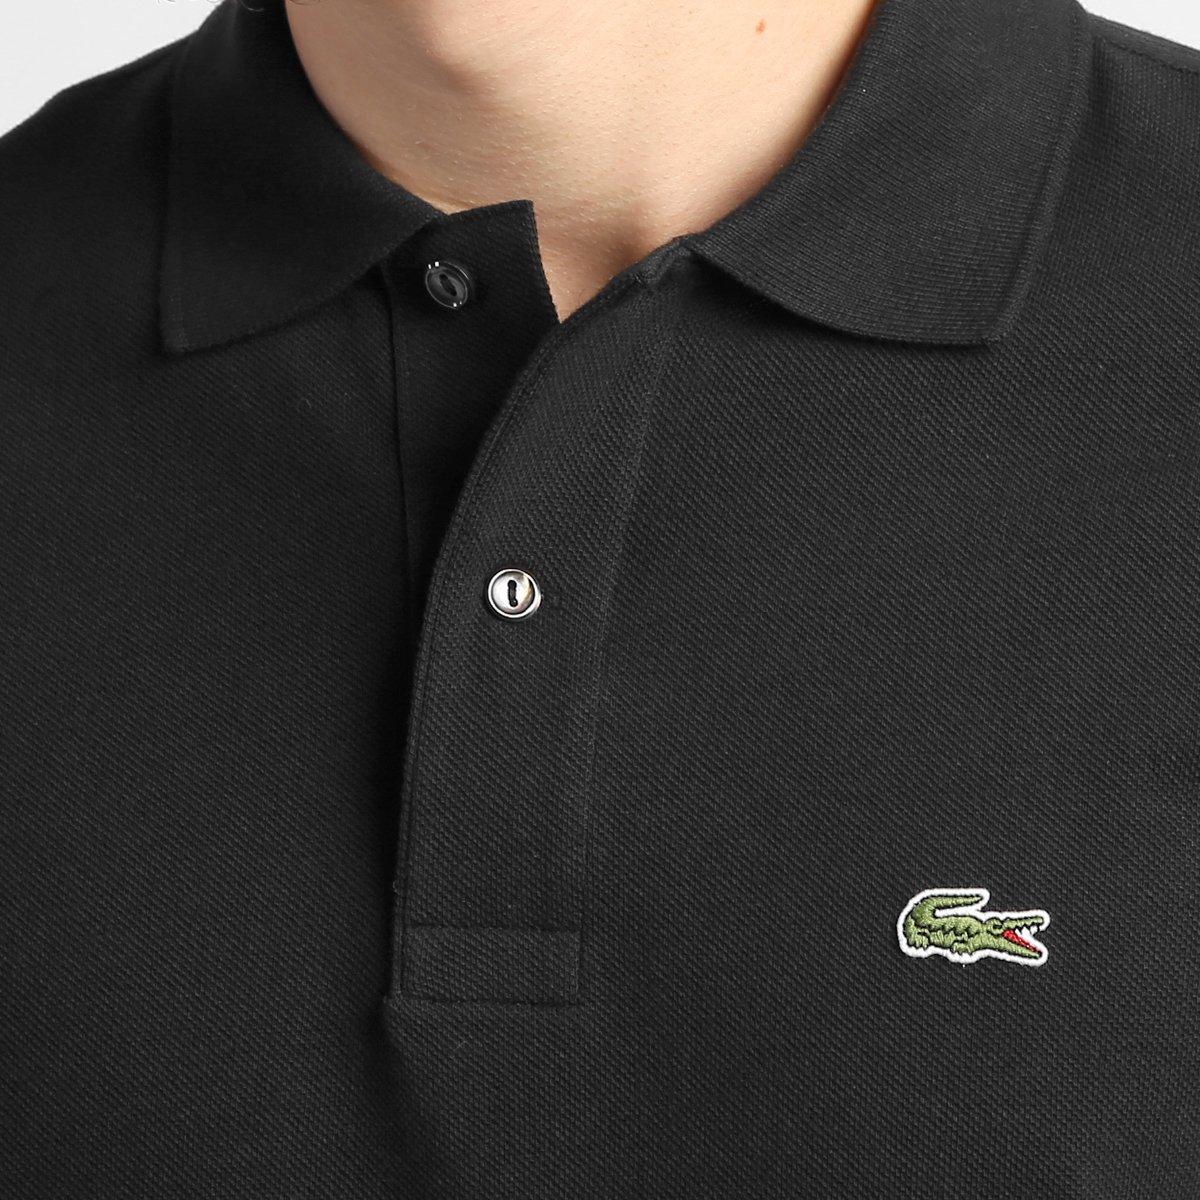 Camisa Polo Lacoste Original Fit Masculina - Preto - Compre Agora ... 5d6061b553